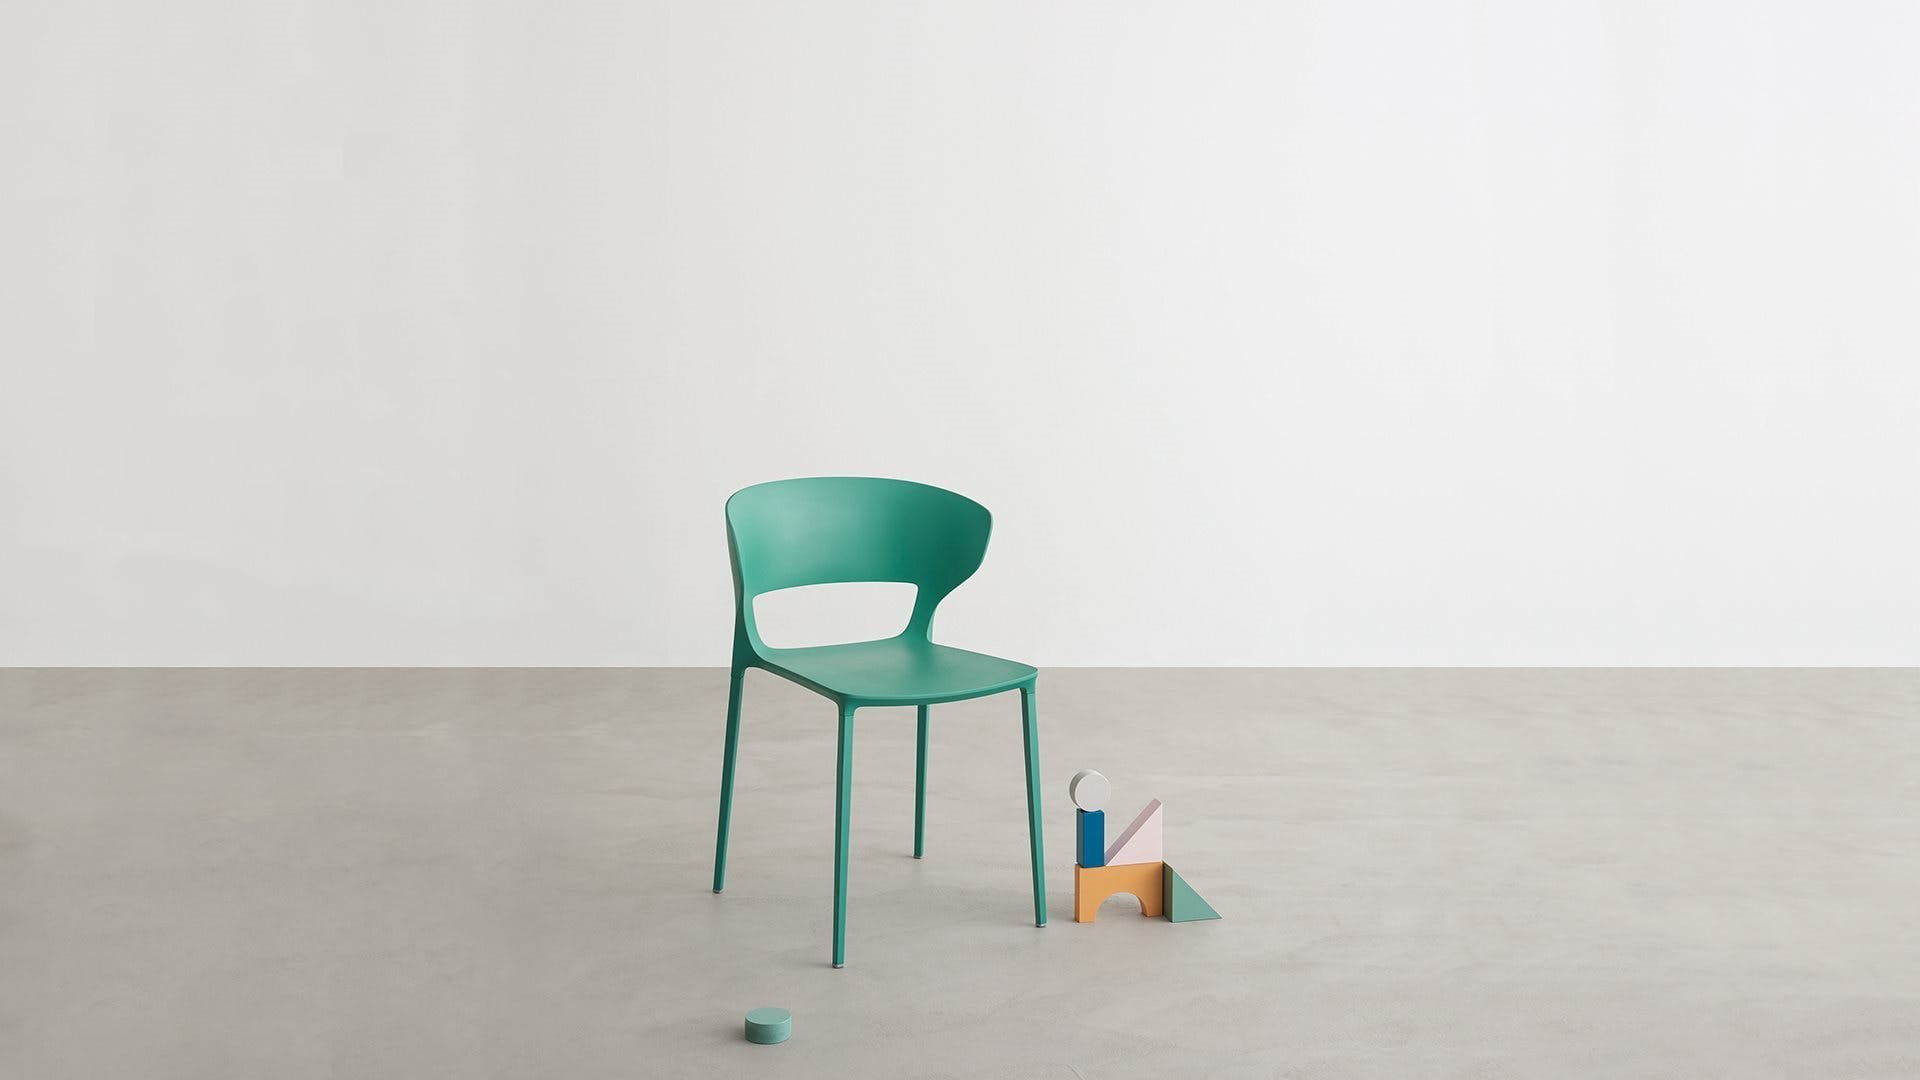 Desalto Product Koki Gallery 02